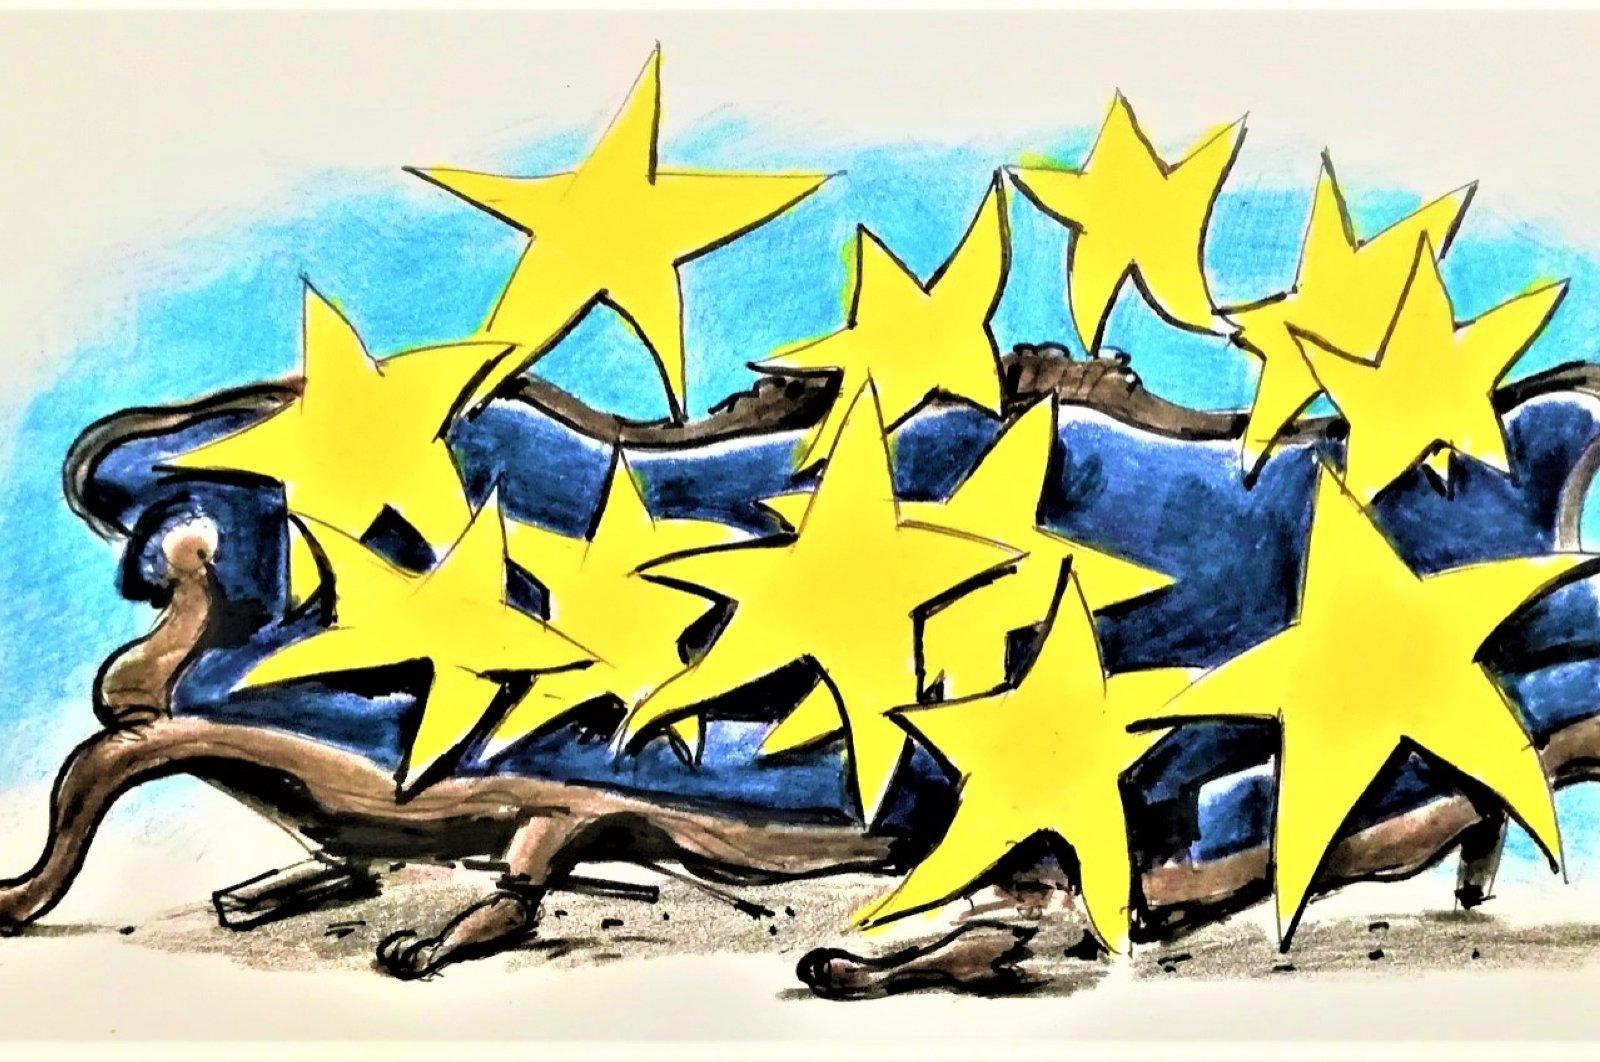 Photo of Stop injustice! EU's disharmony and dystopian future